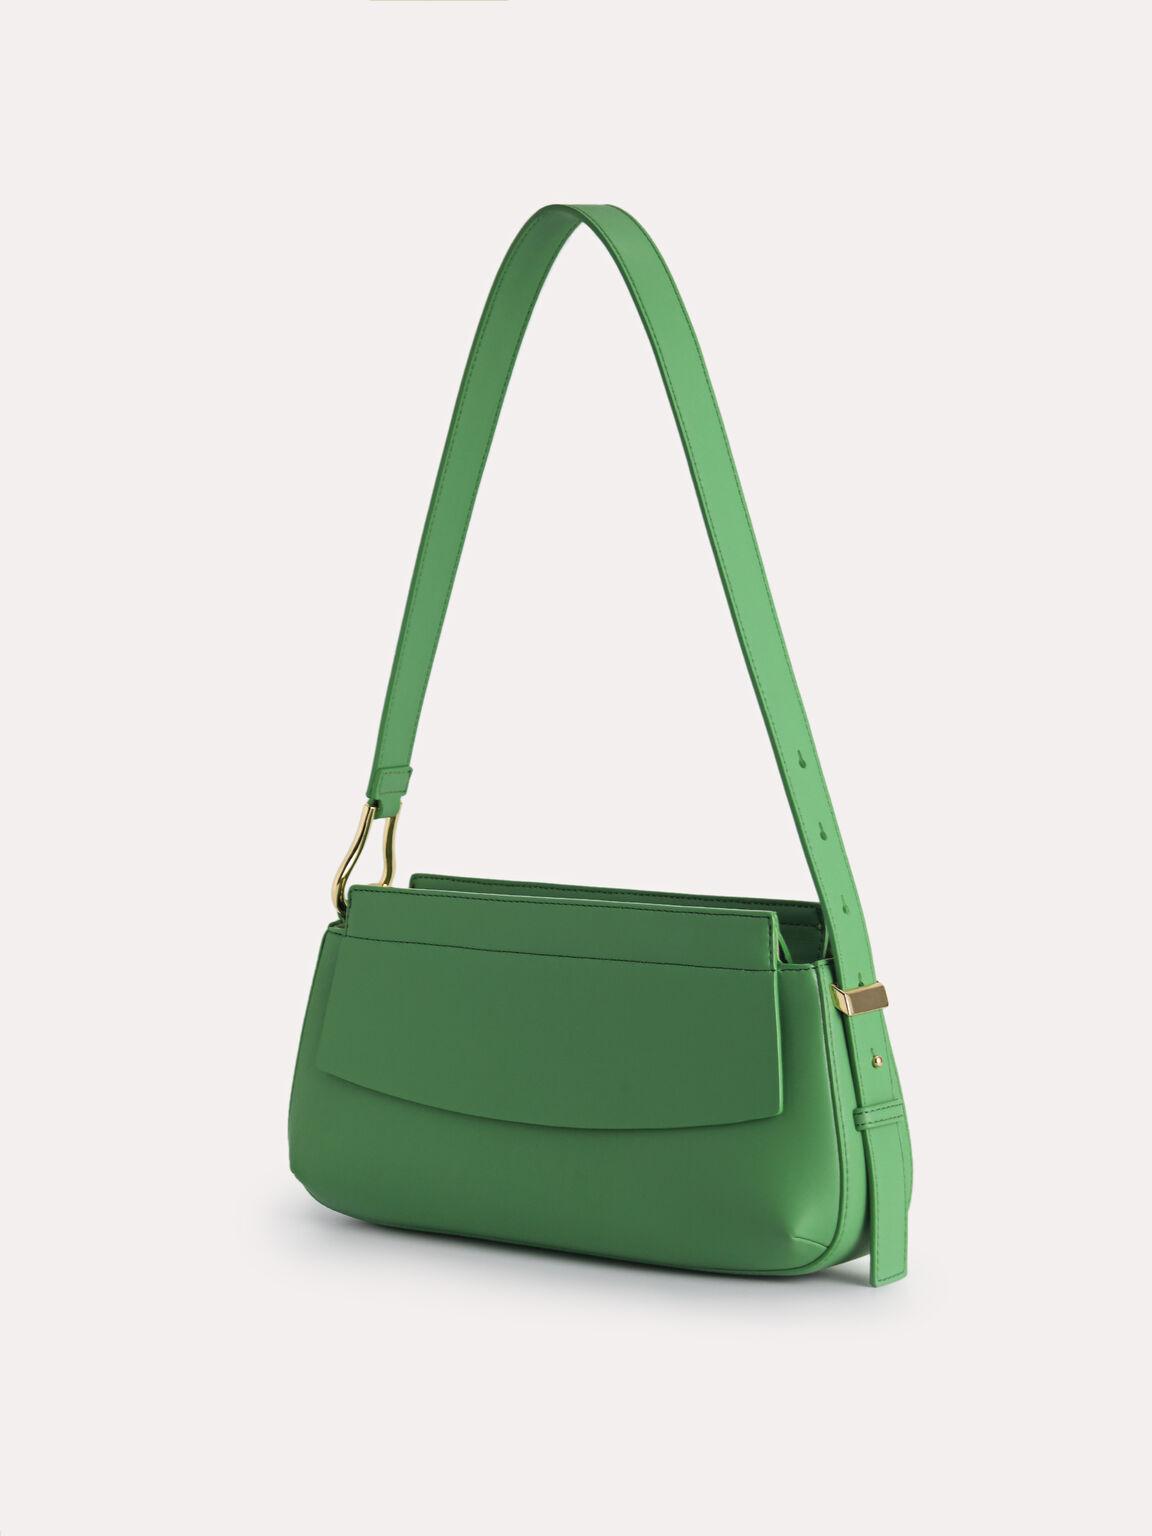 Baguette Shoulder Bag, Green, hi-res